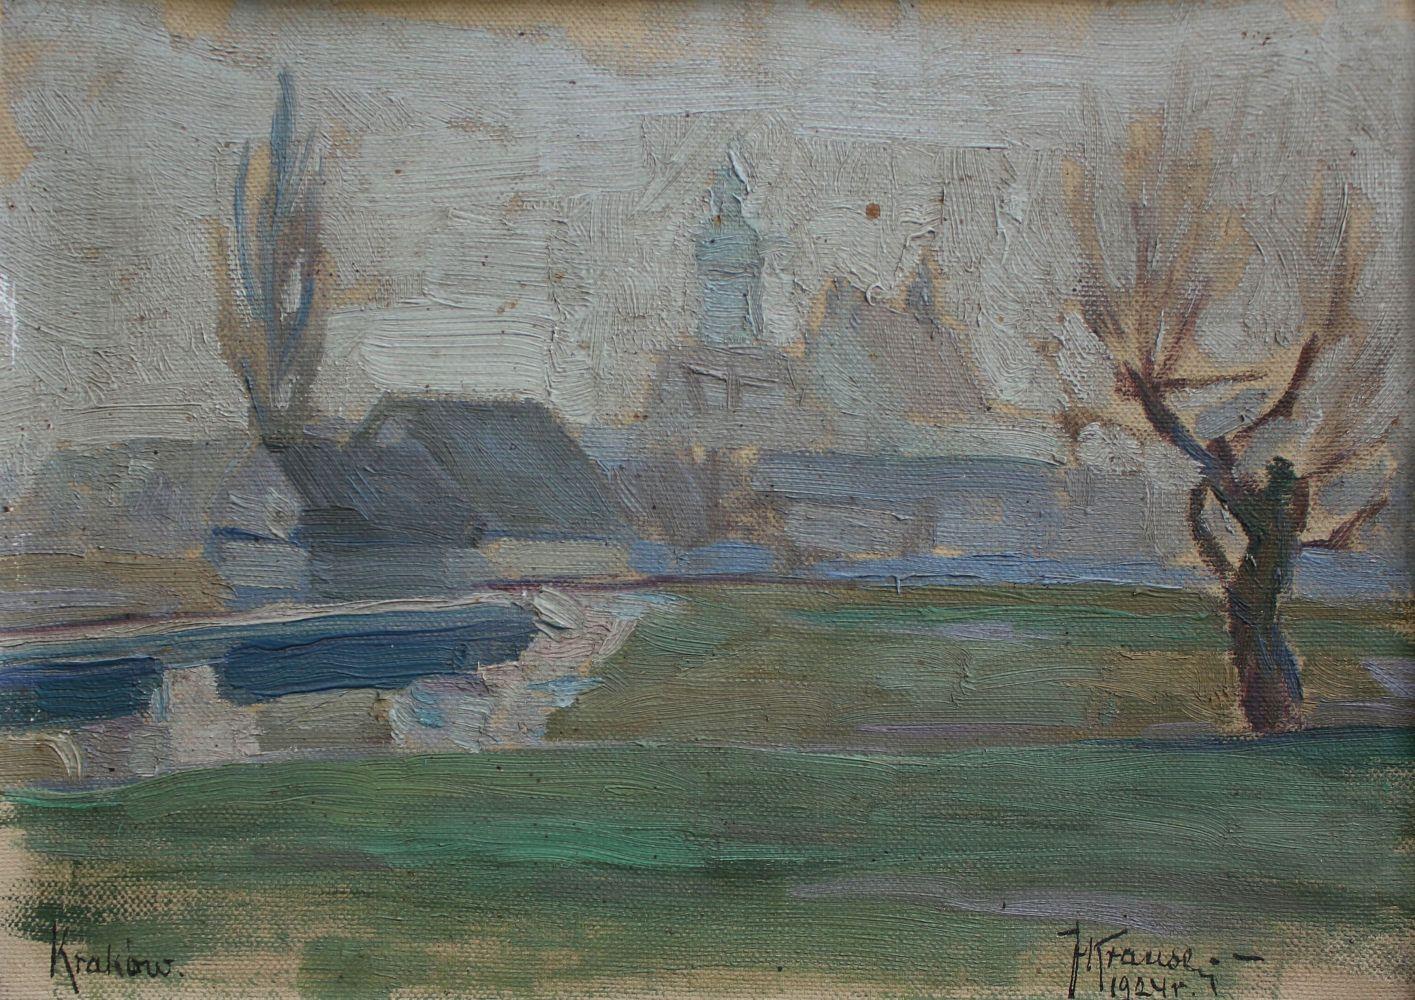 Pejzaż podkrakowski (1924)